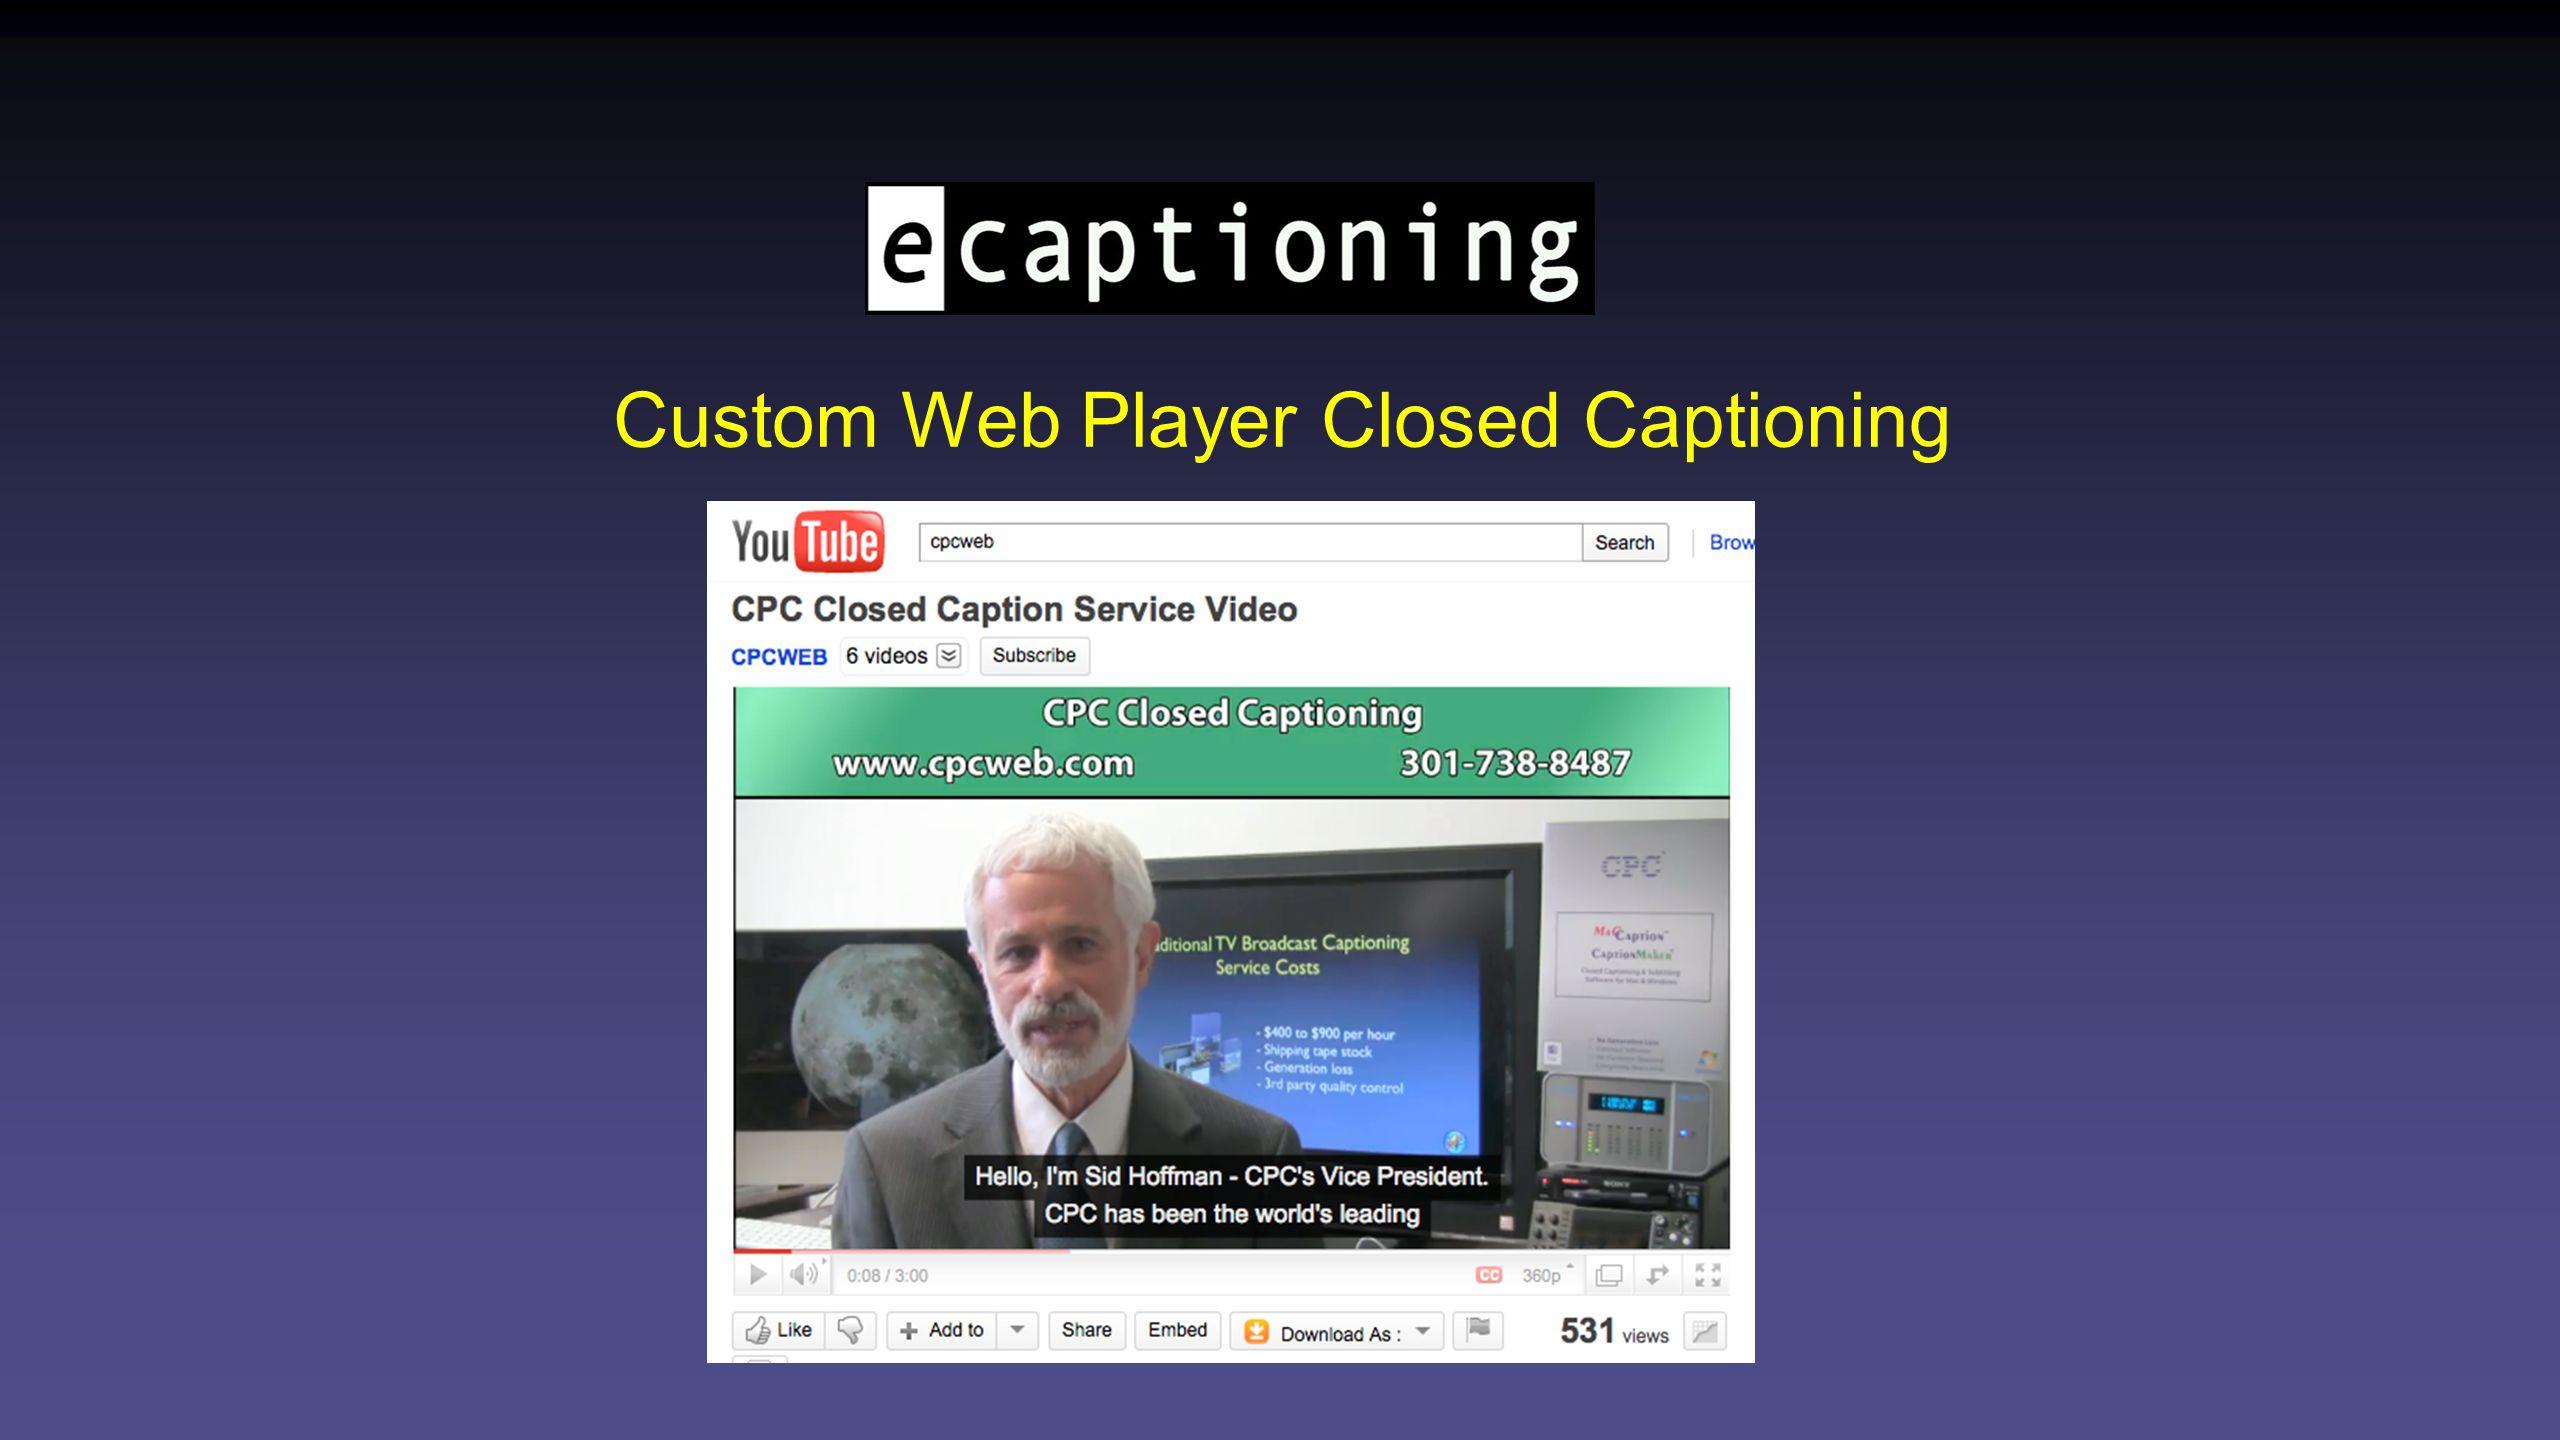 Custom Web Player Closed Captioning